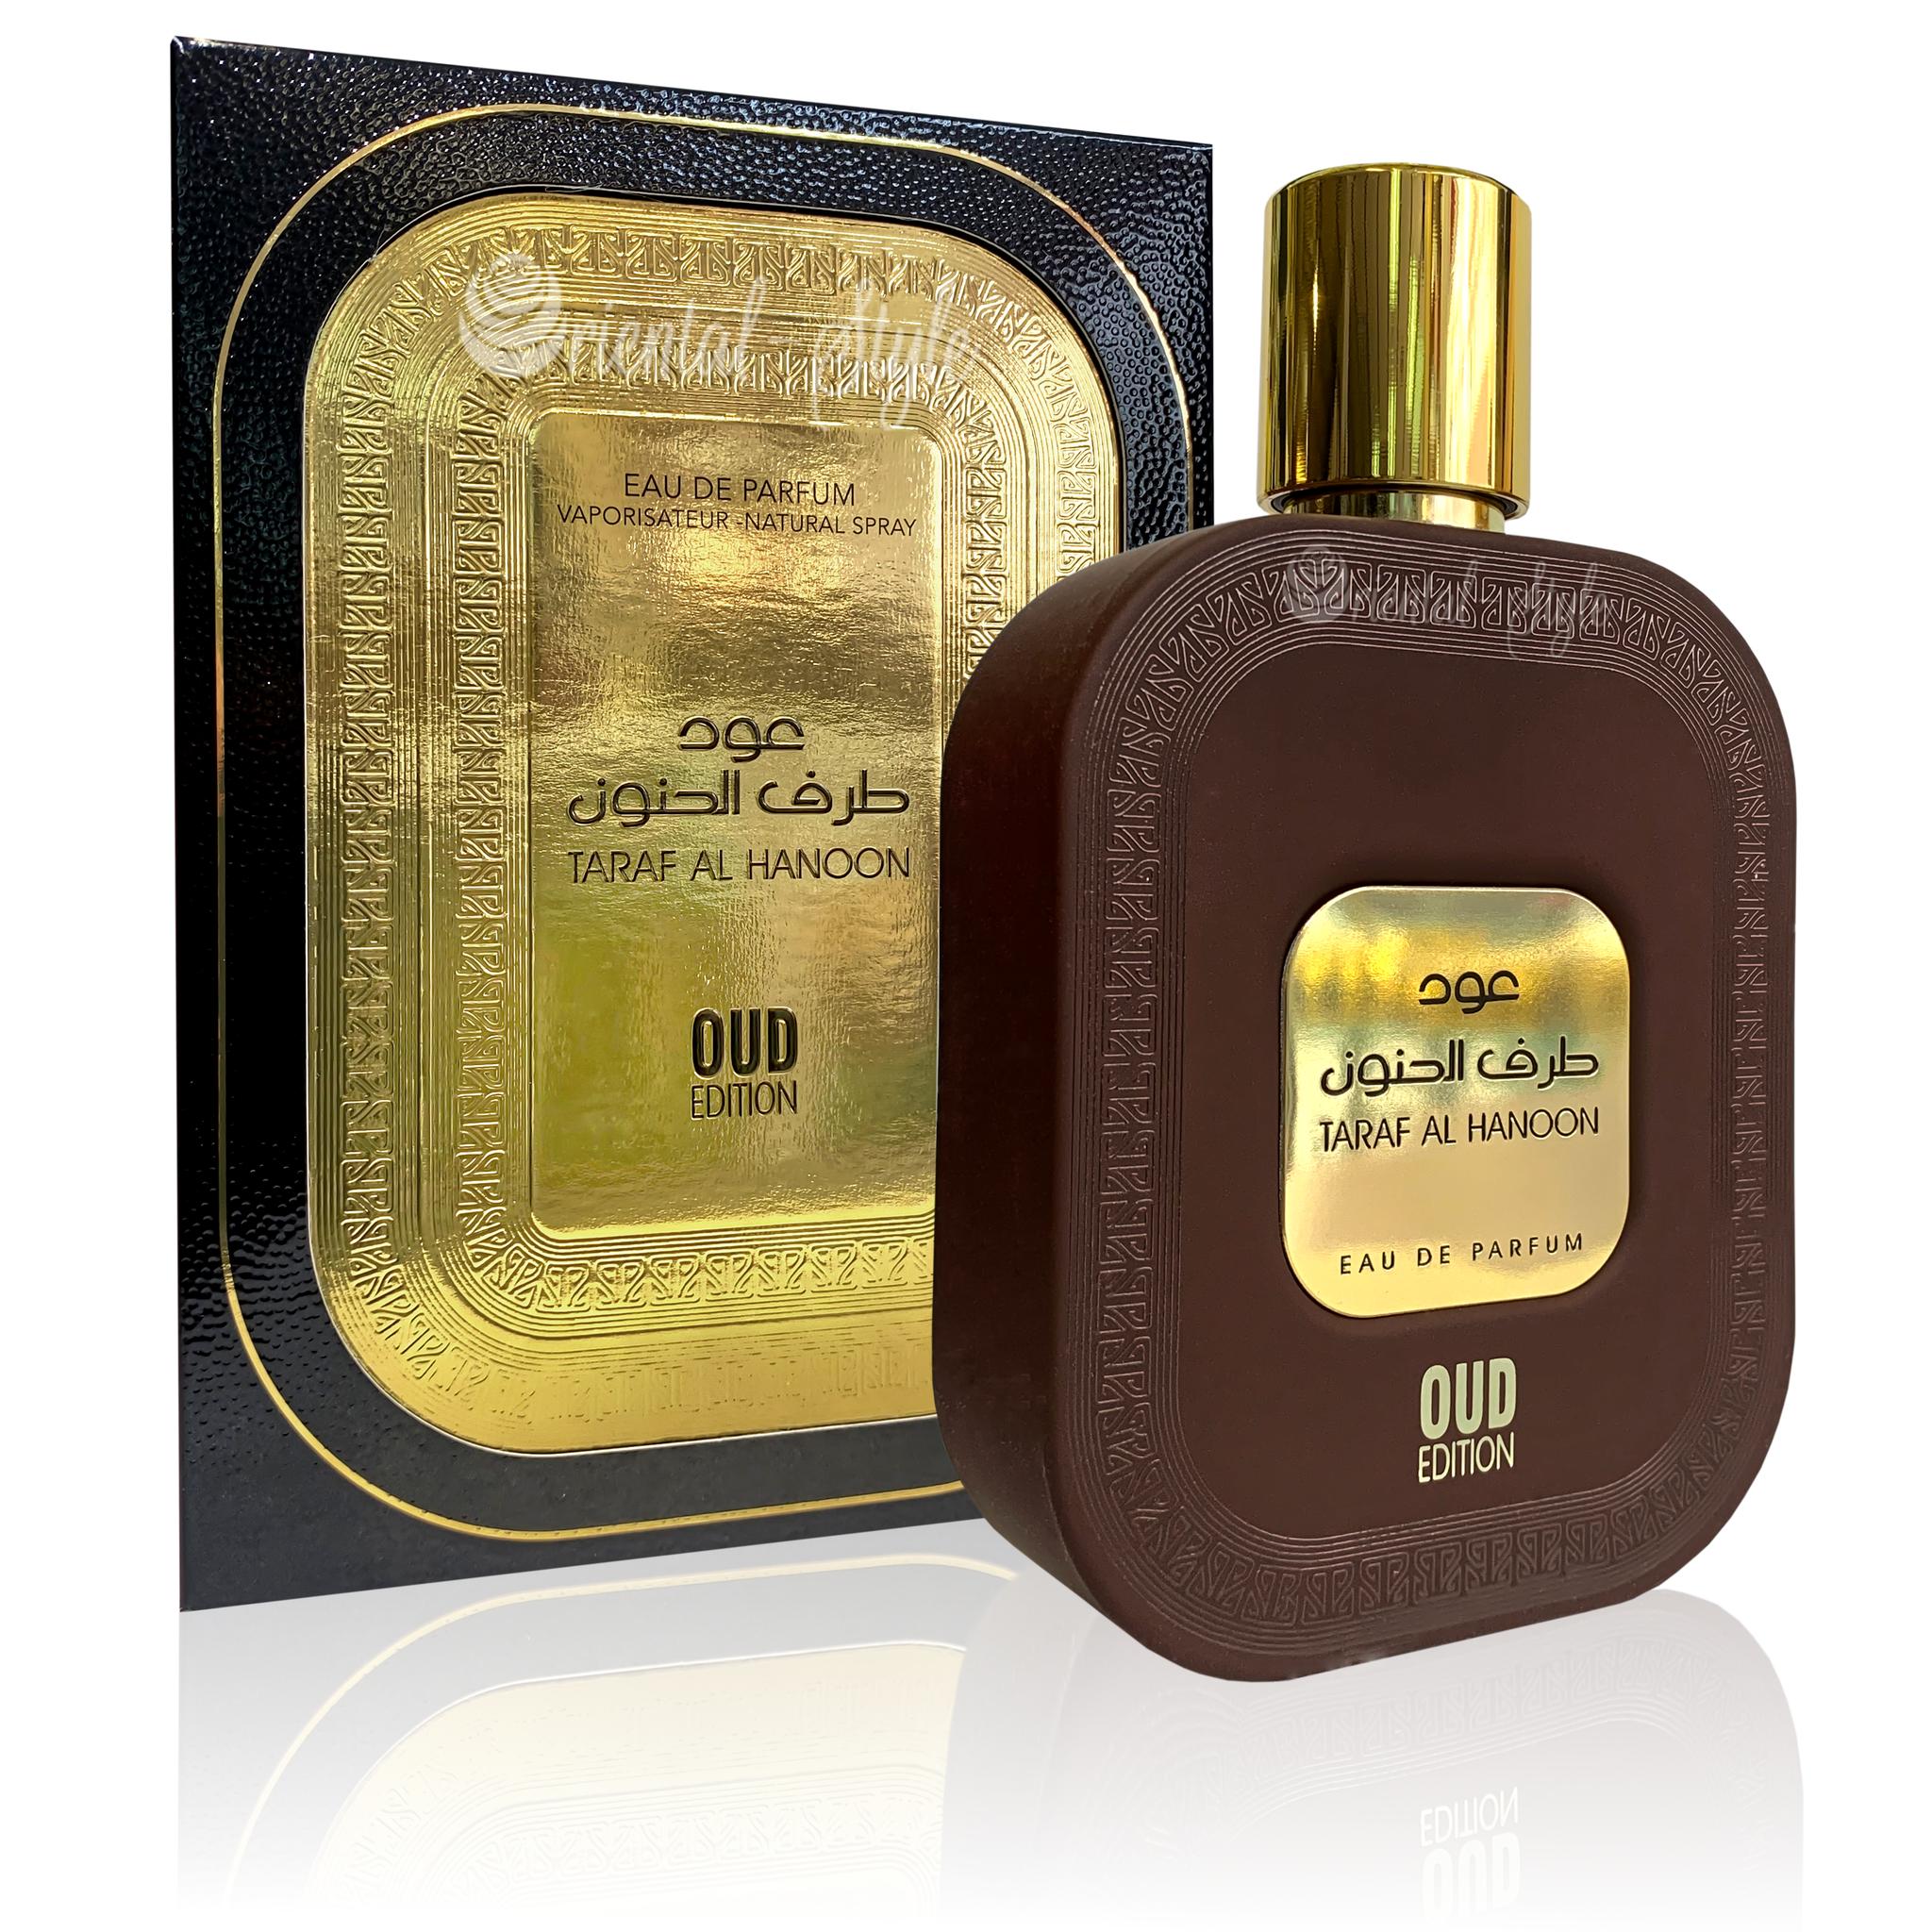 Ard Al Zaafaran Lord Eau de Parfum Perfume